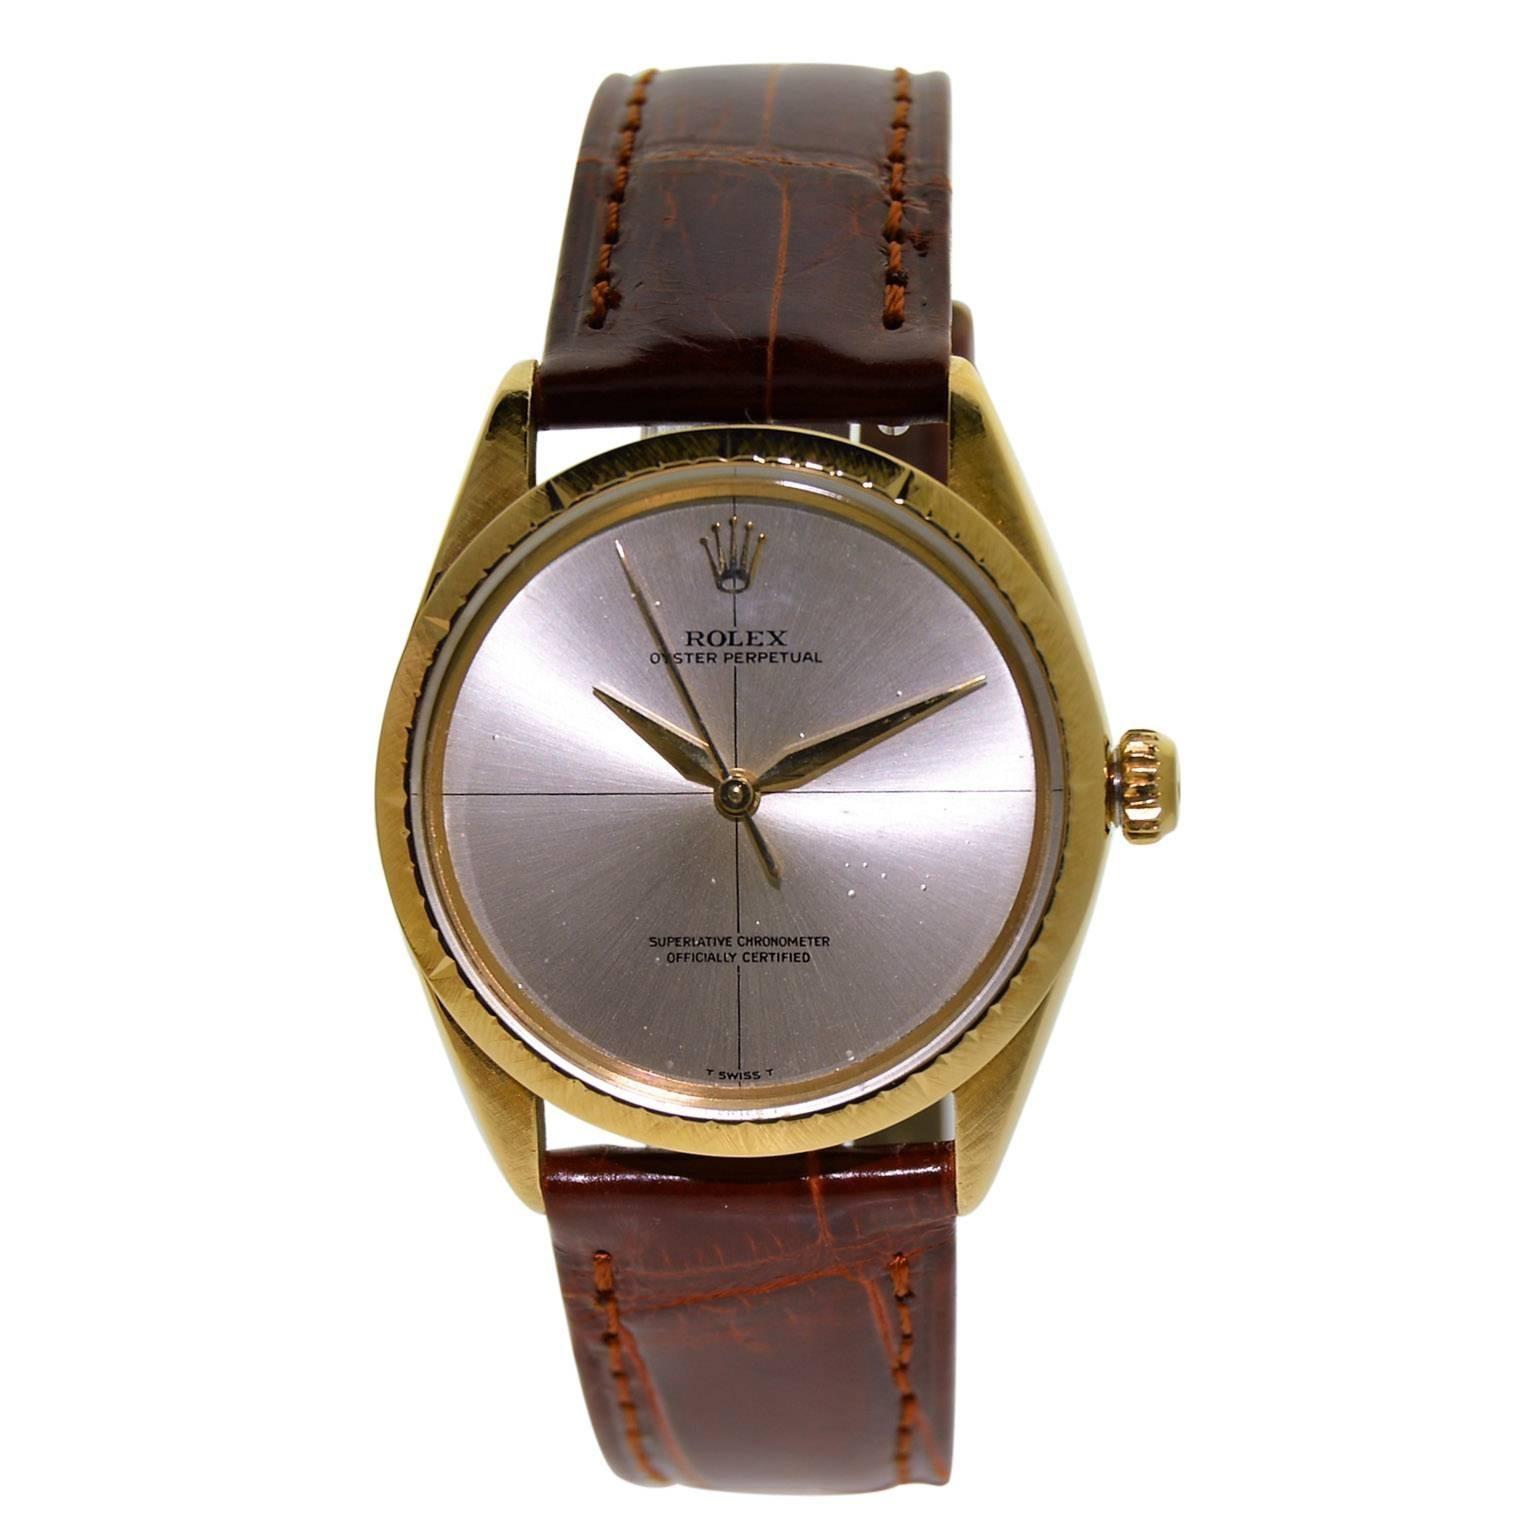 Rolex Yellow Gold Zephyr Perpetual Wind Wristwatch Ref 1009, circa 1967